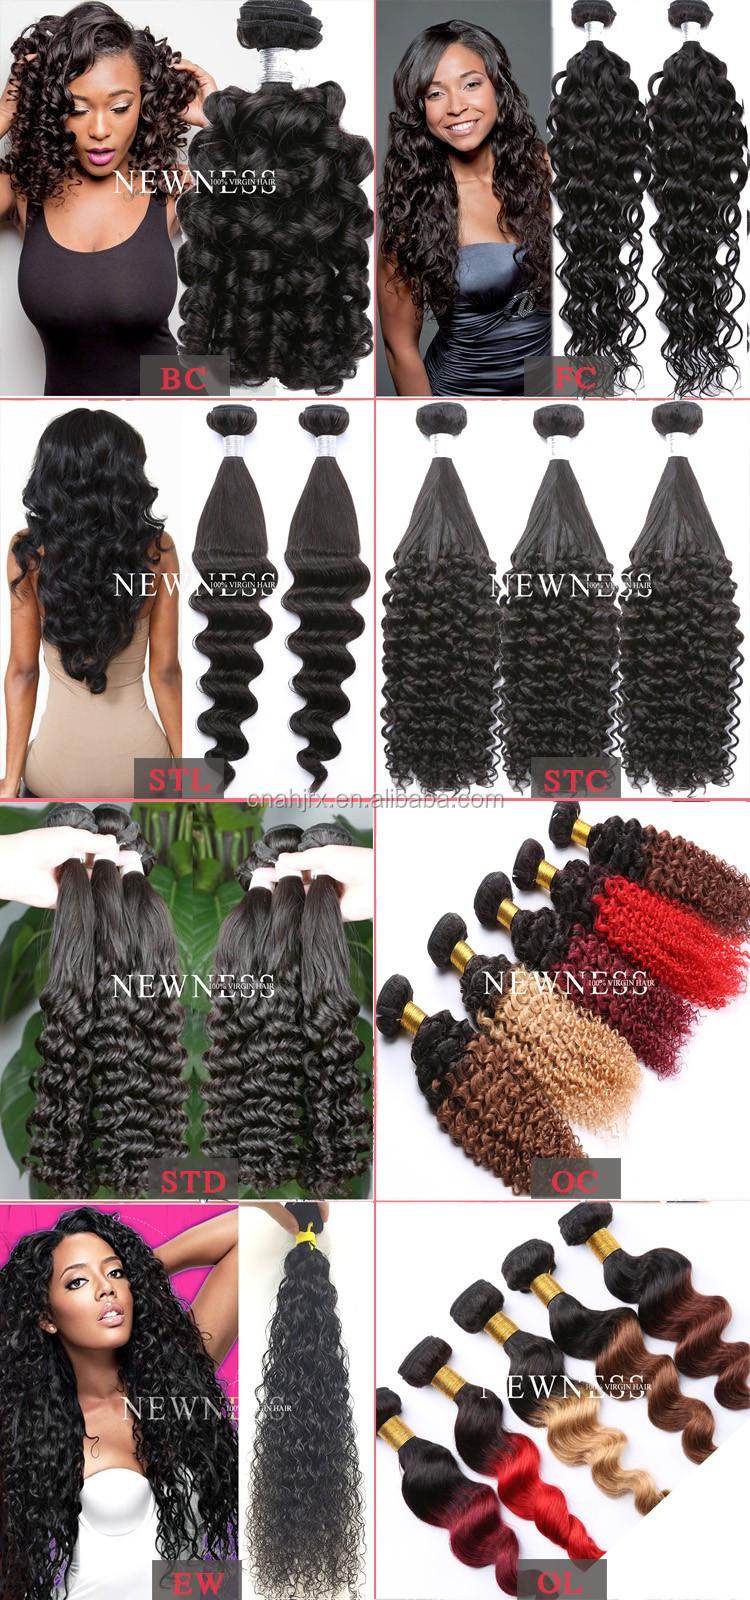 Brazilian Hairhuman Hair Bulkbrazilian Deep Curly Ombre Hair Weave